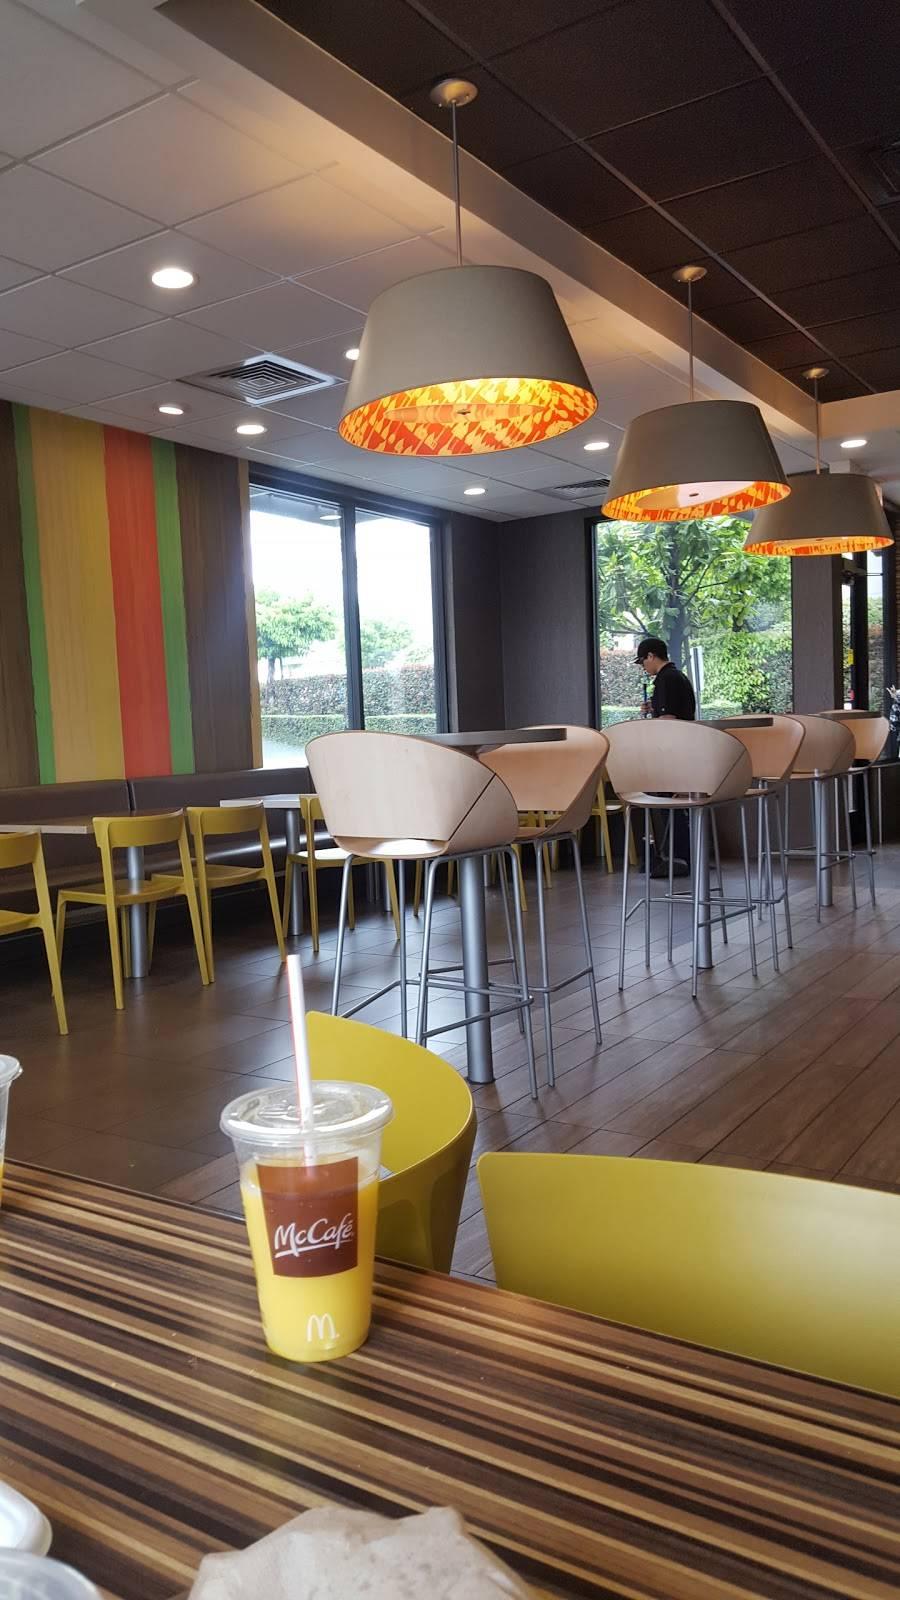 McDonalds - cafe    Photo 6 of 9   Address: 1615 S Riverside Ave, Rialto, CA 92376, USA   Phone: (909) 820-1600